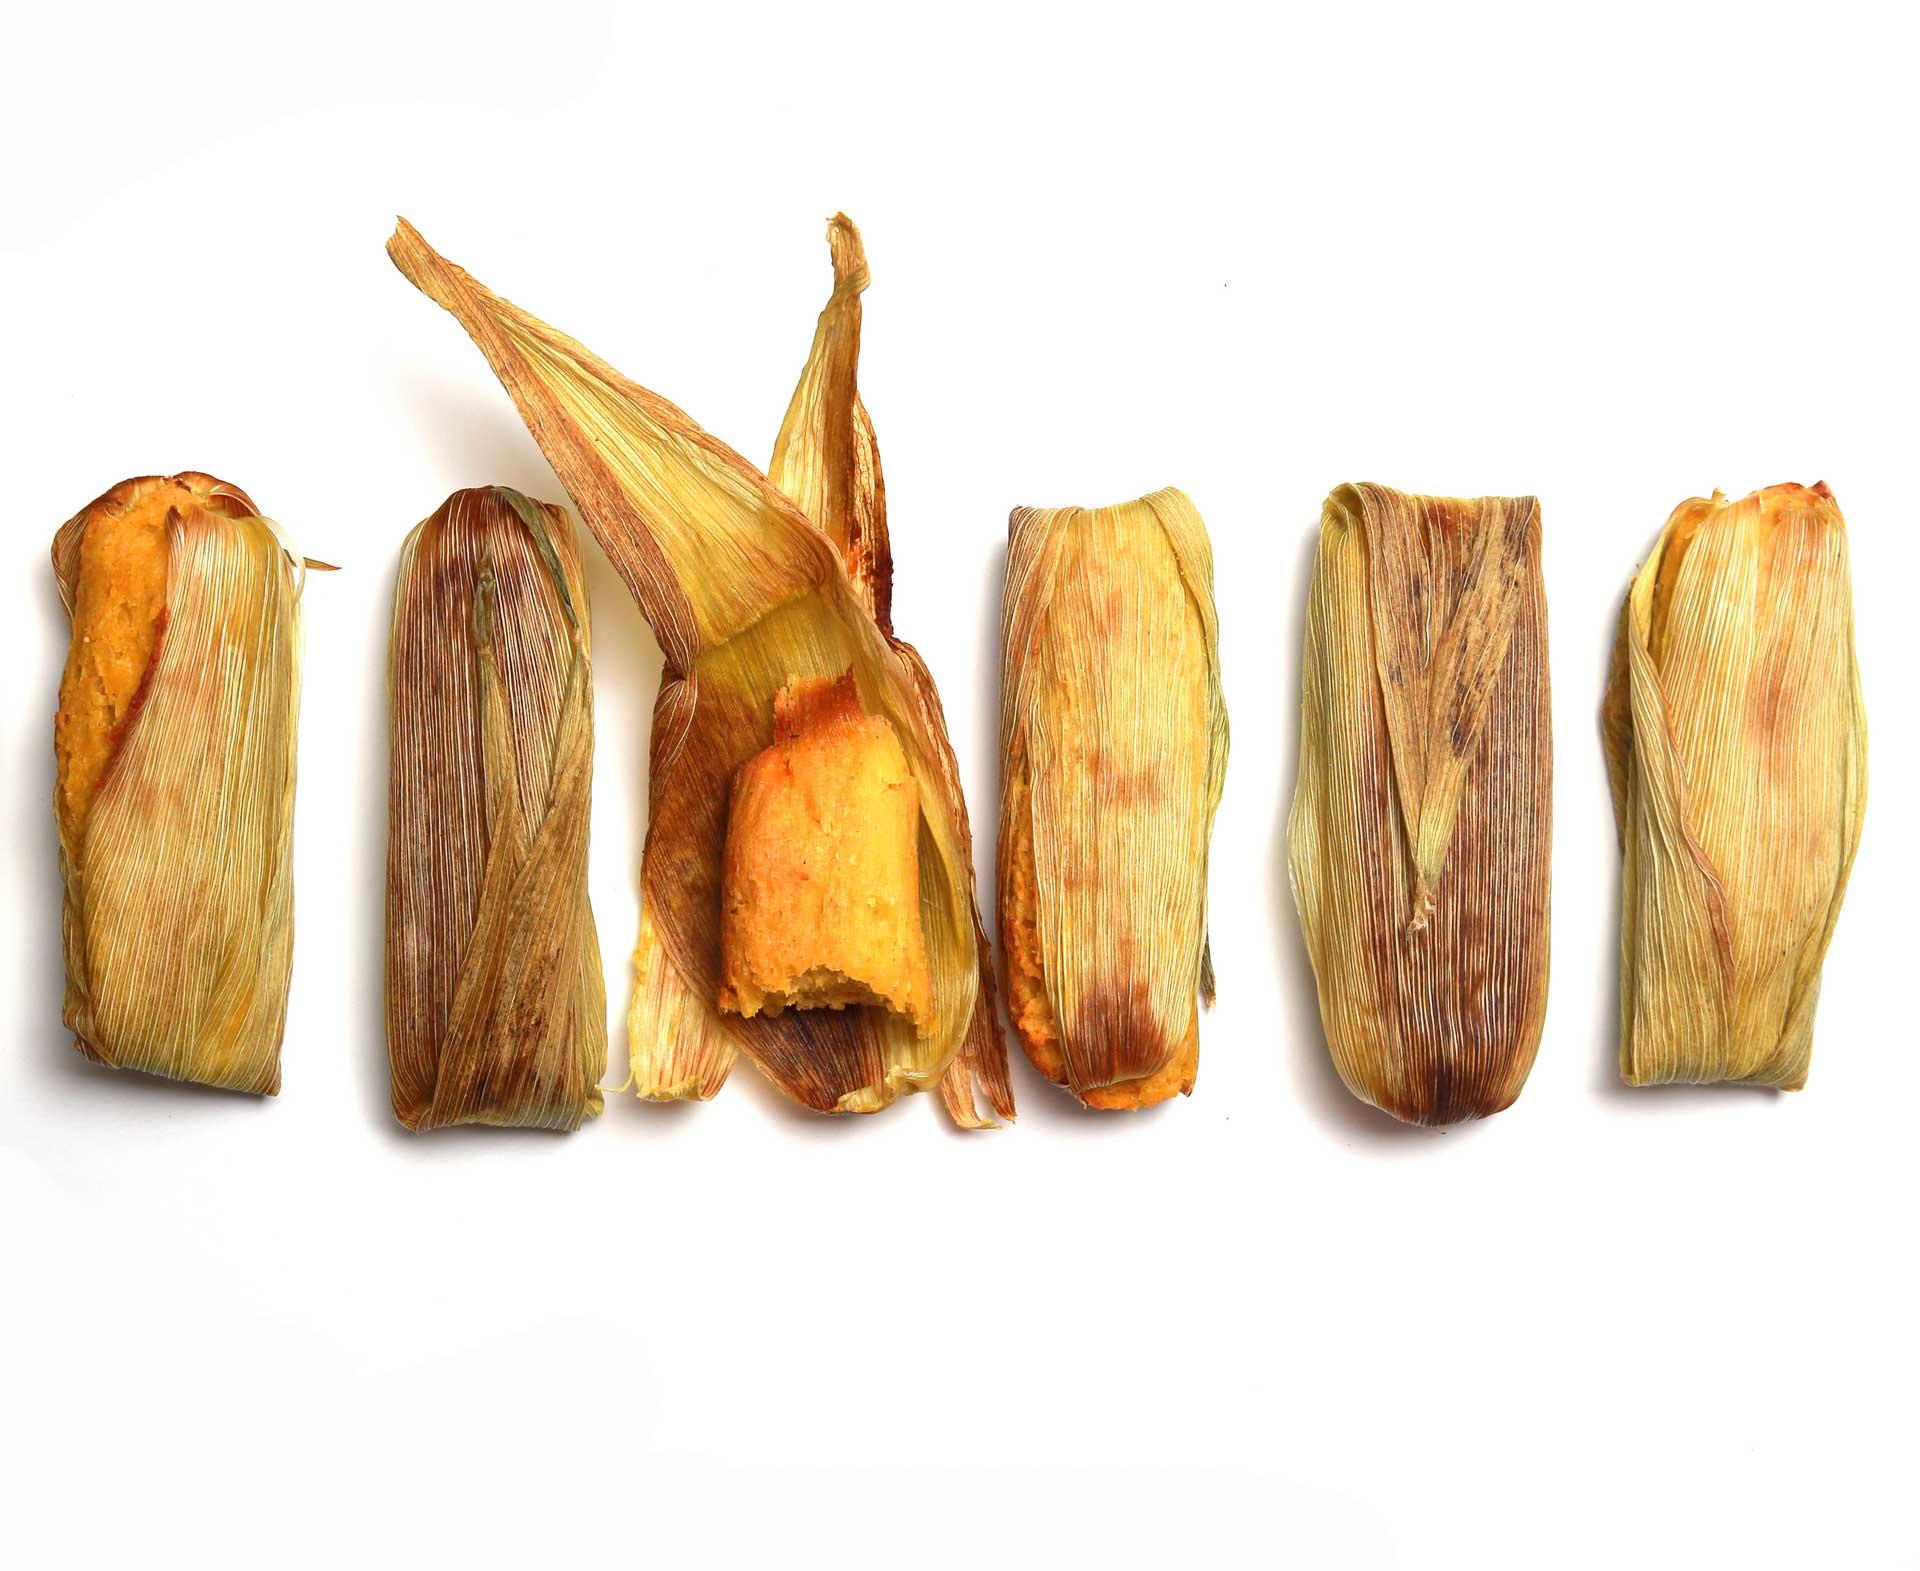 CORN-Navajo-kneel-bread.jpg